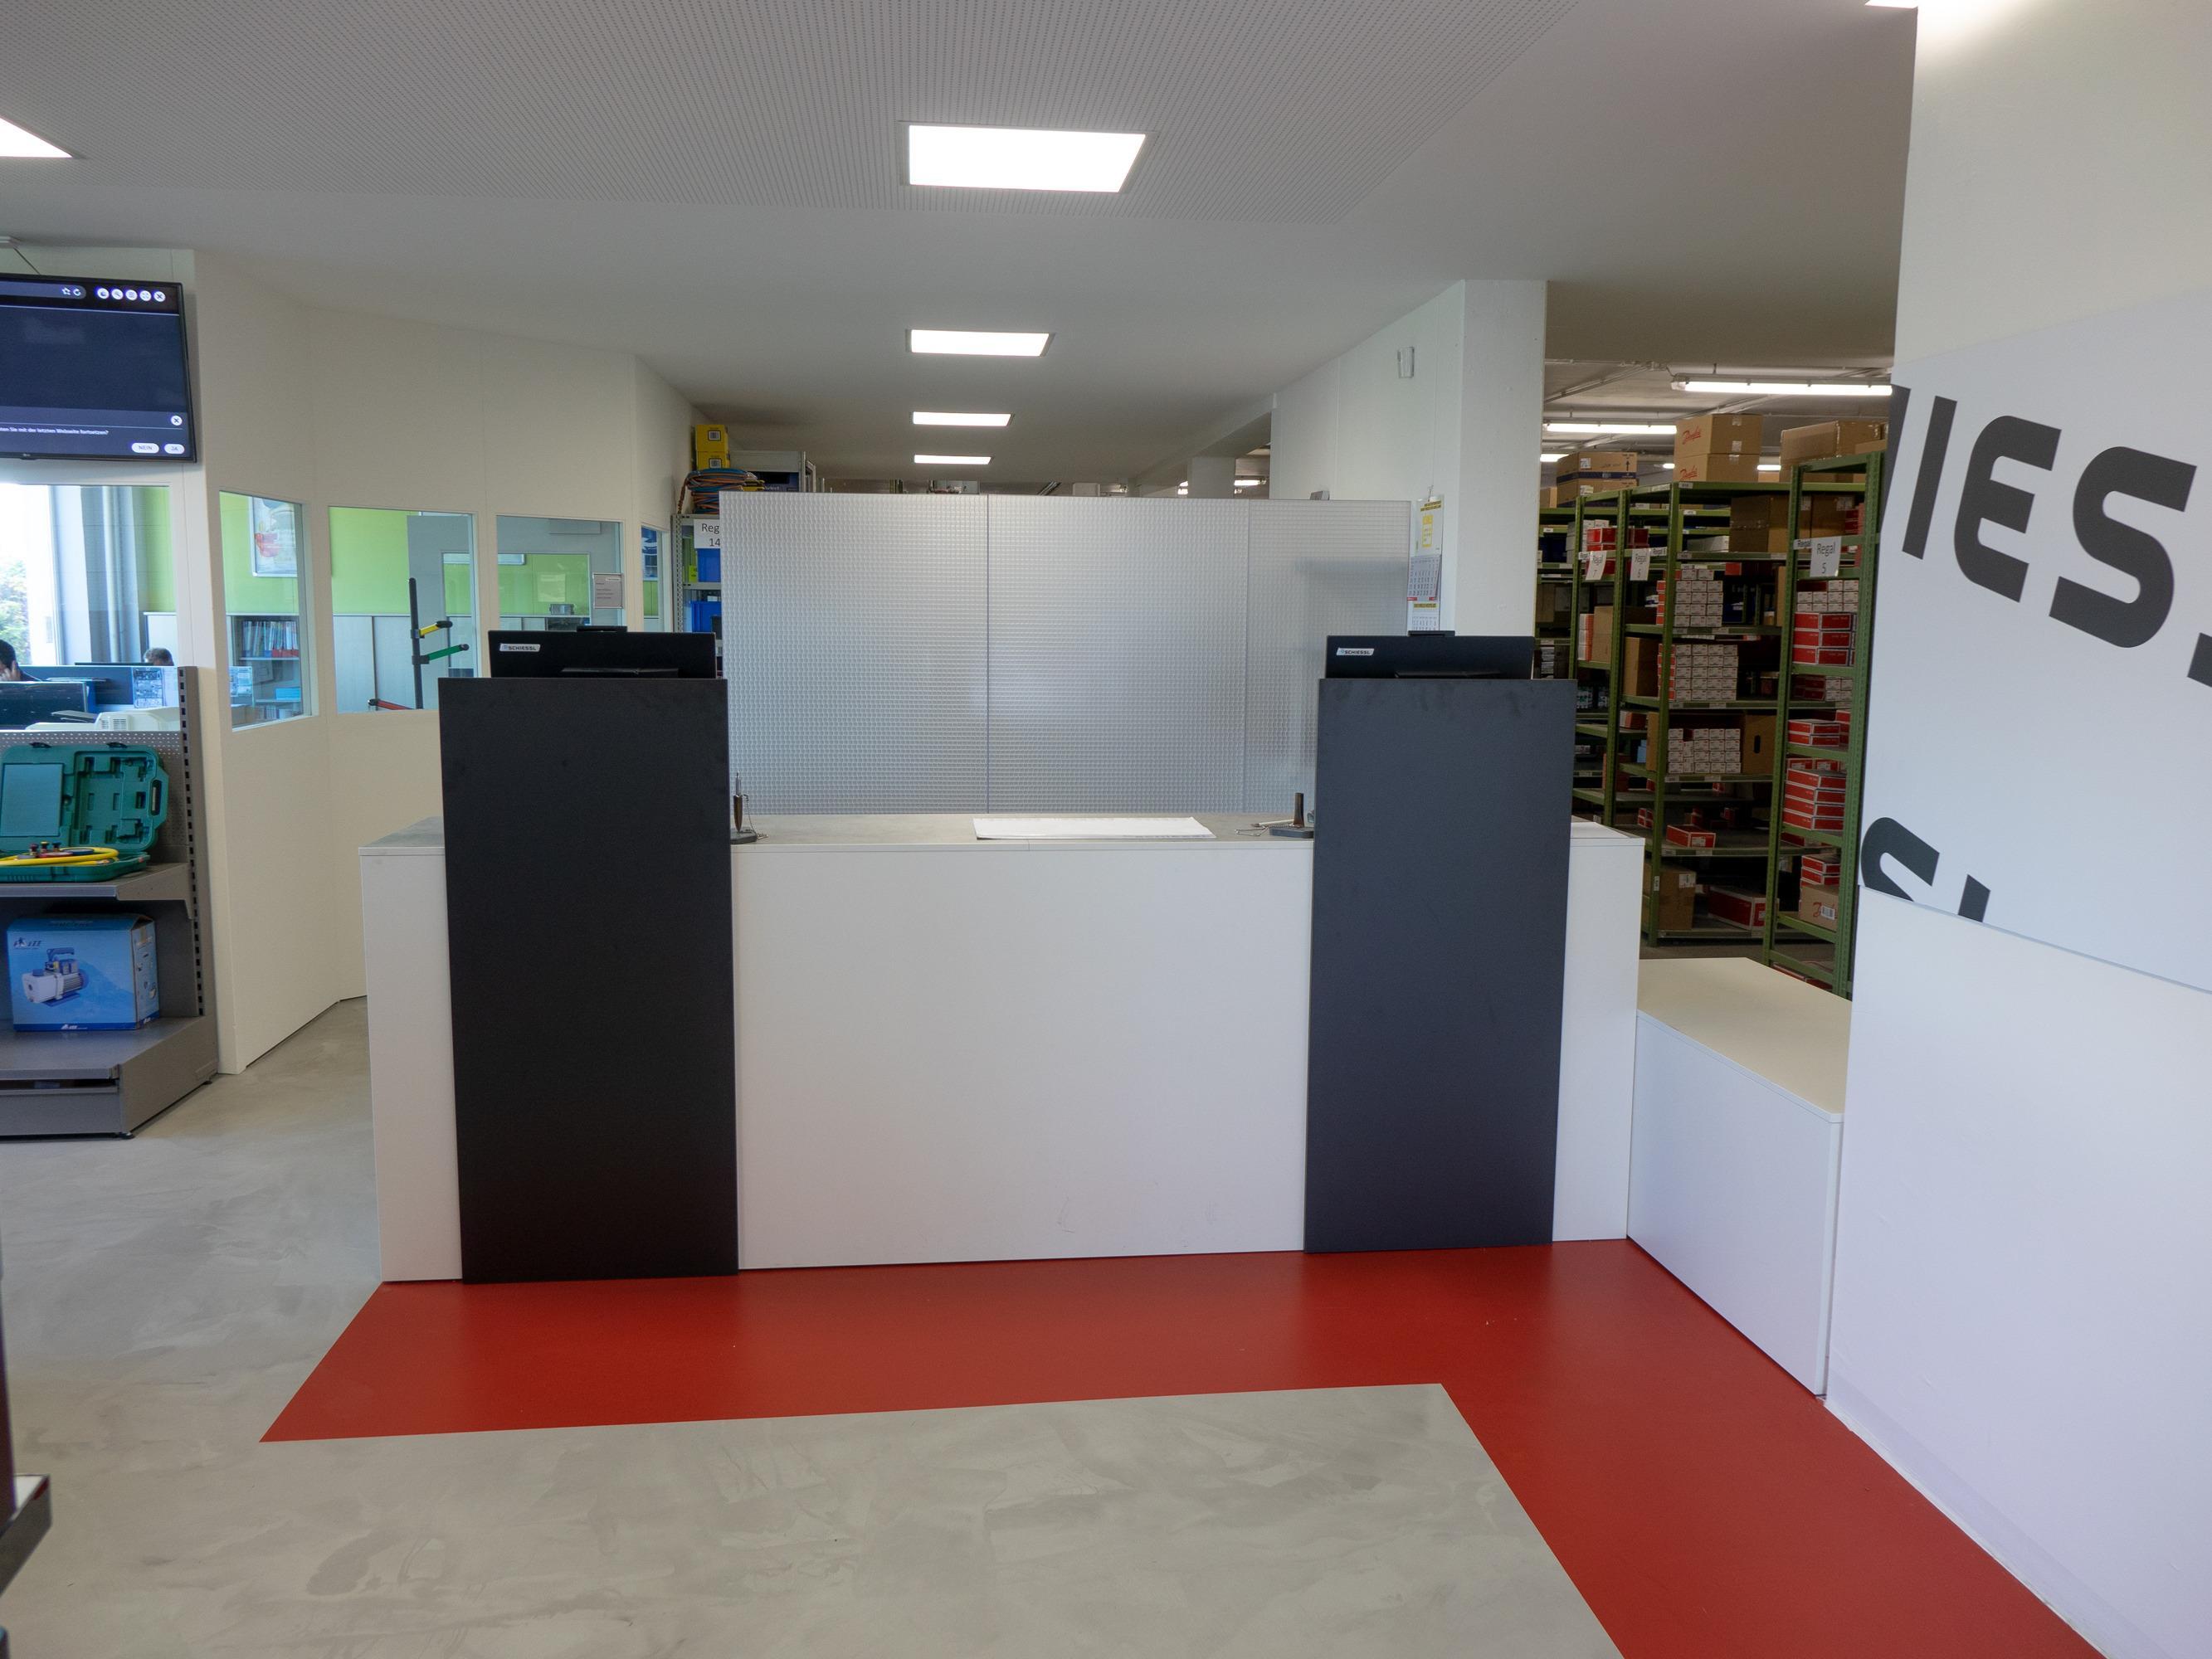 Krauterregal Kuche Wohnmobil Kuche Ausbauen Ikea Kuche Faktum Alt